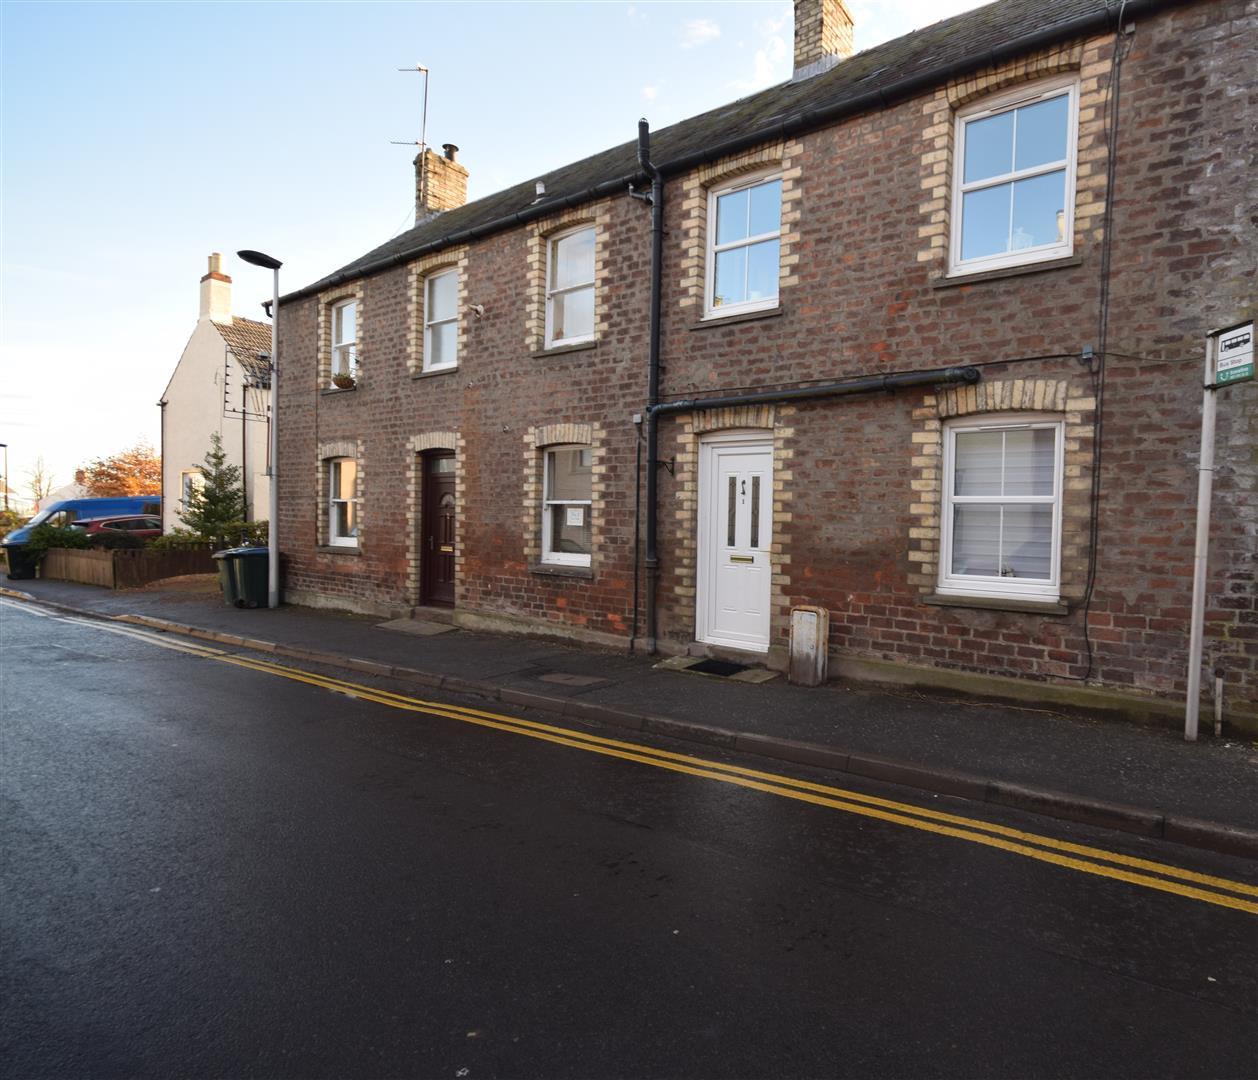 1 Bruce Buildings, High Street, Errol, Perth, Perthshire, PH2 7QJ, UK